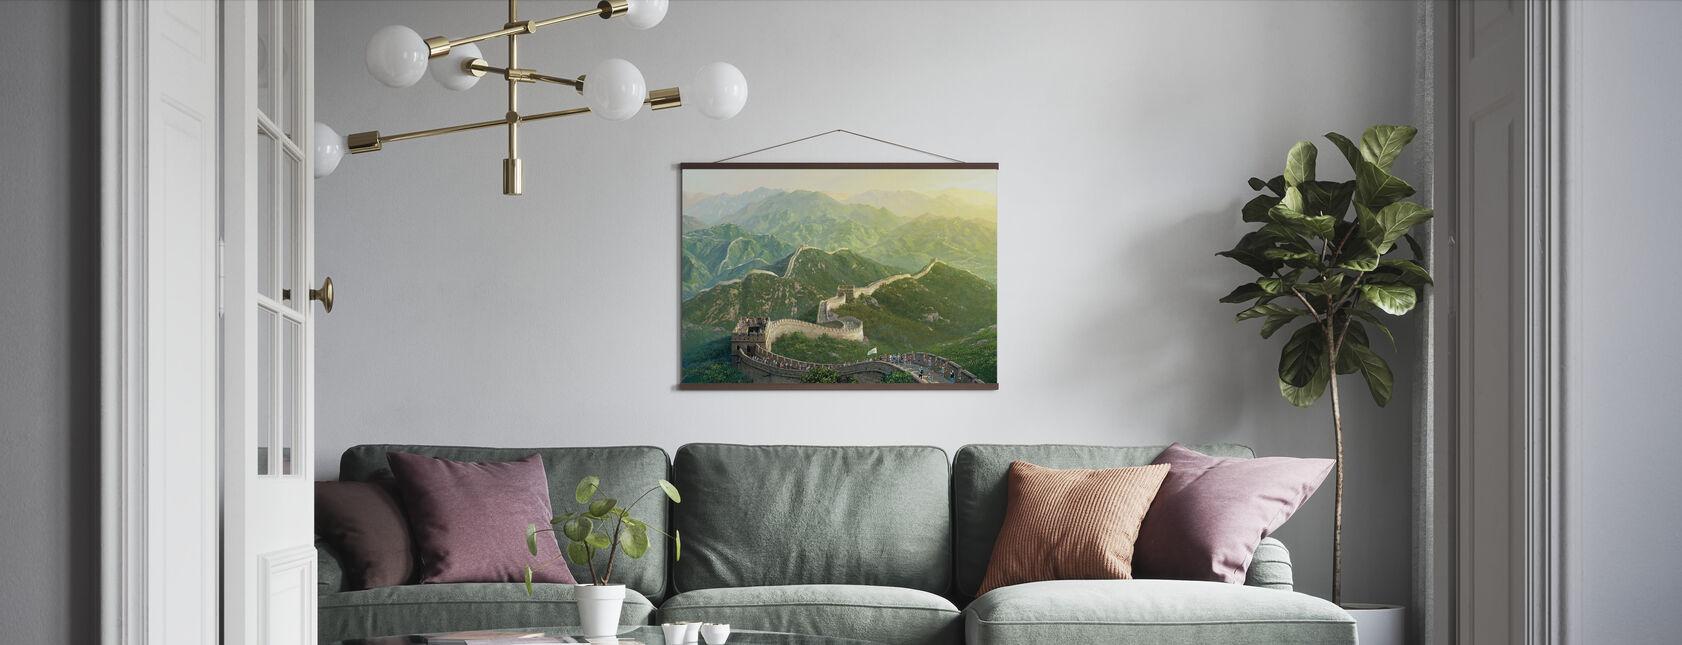 Grote (Chinese) Muur